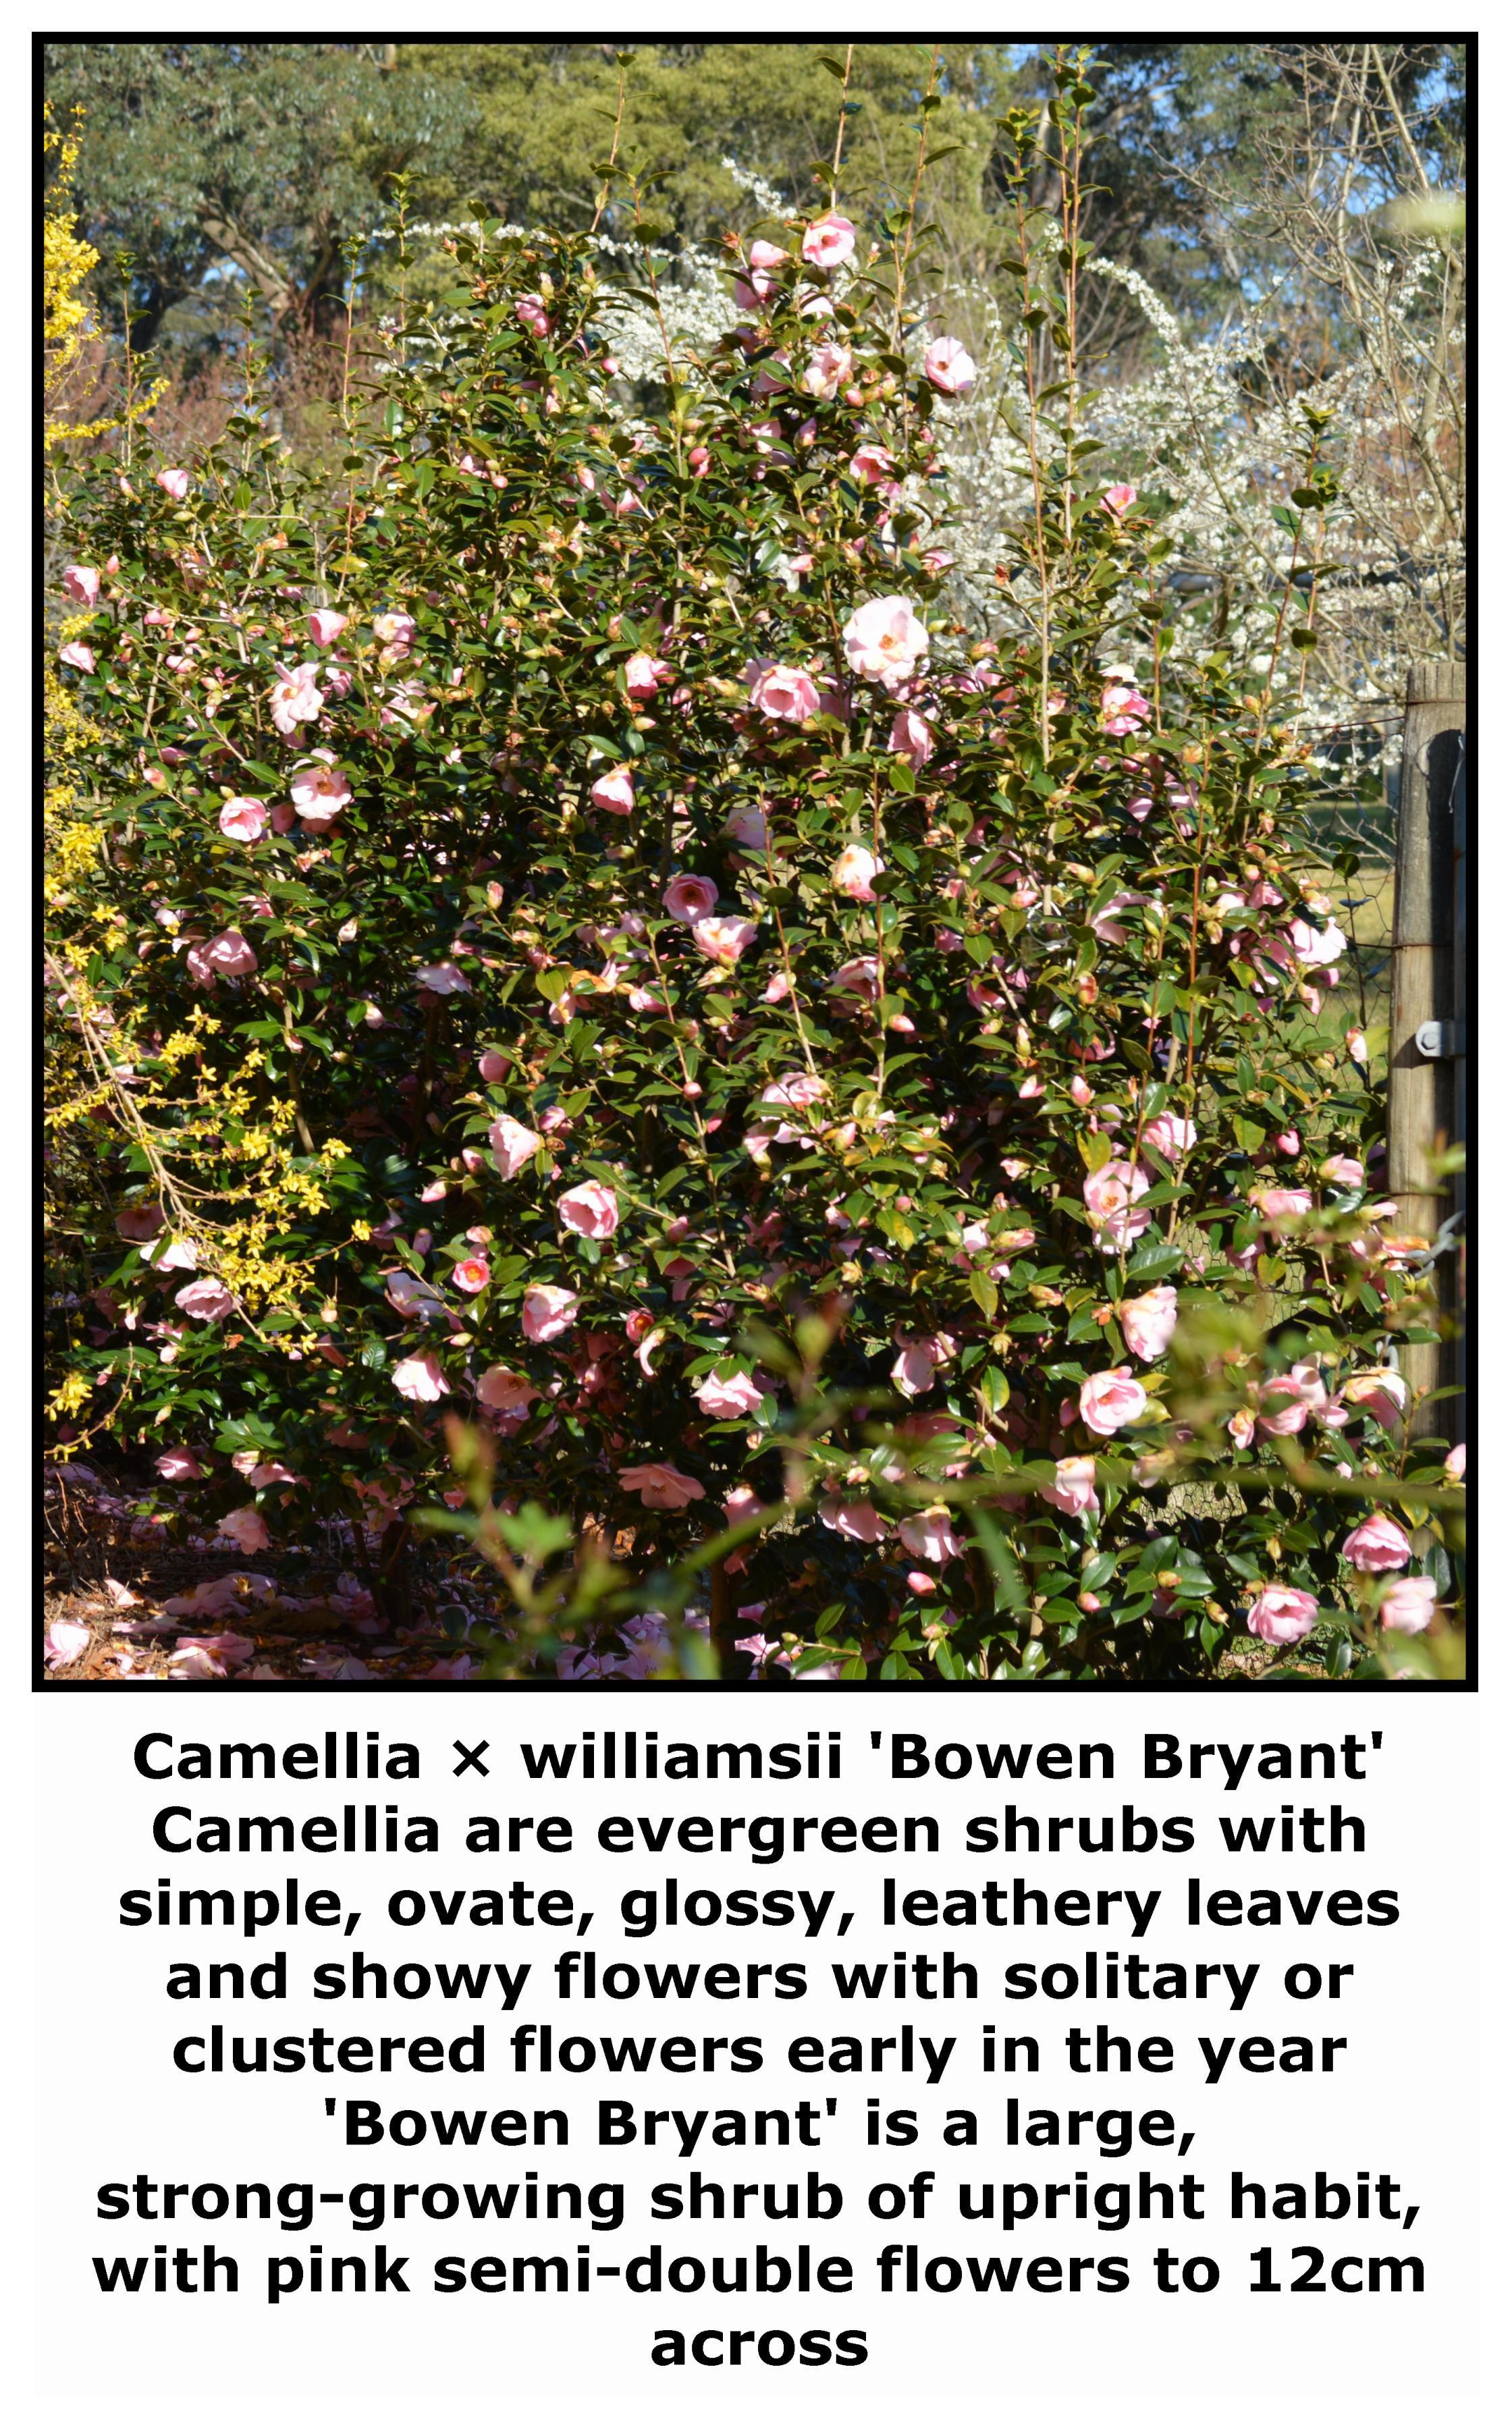 Camellia 'Bowen bryant